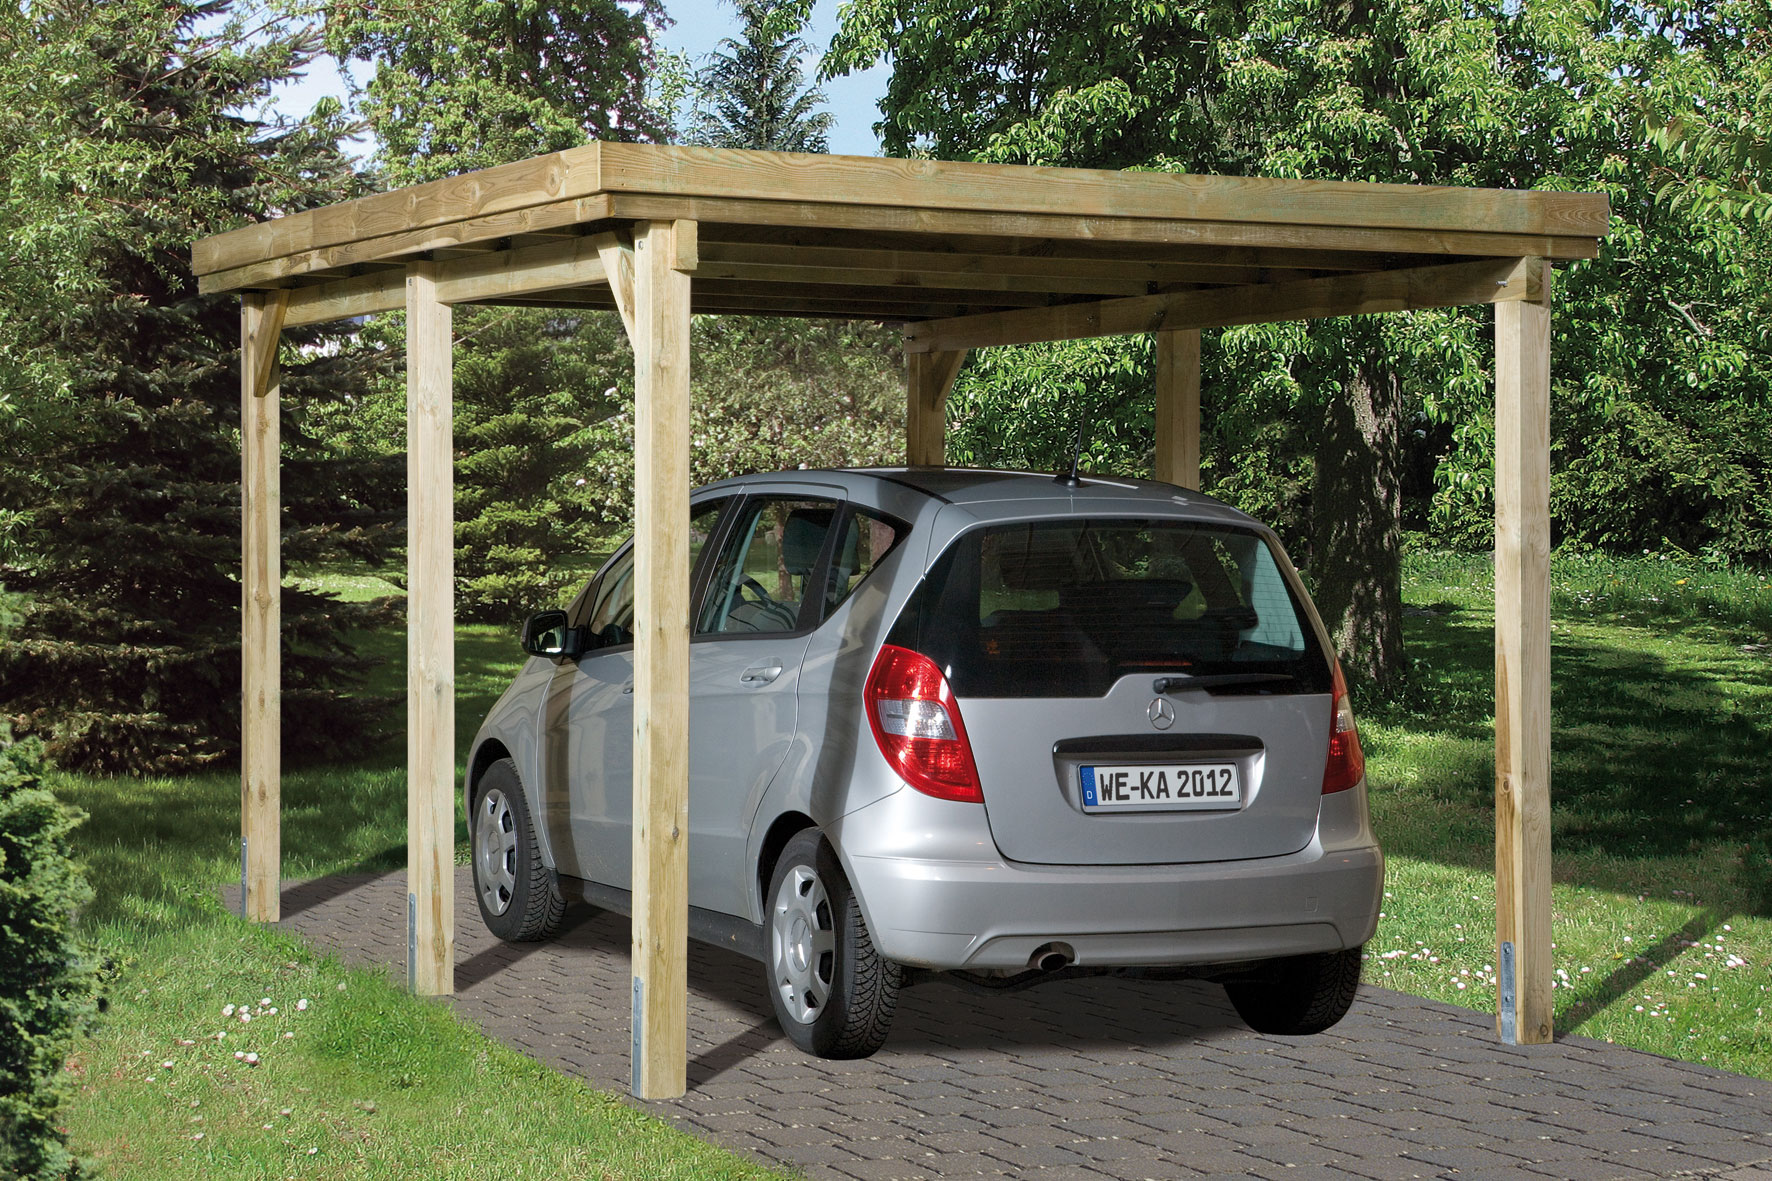 Carport Weka Einzelcarport 617 Gr. 2 Holz kdi + Kunststoff 322x612cm Bild 1